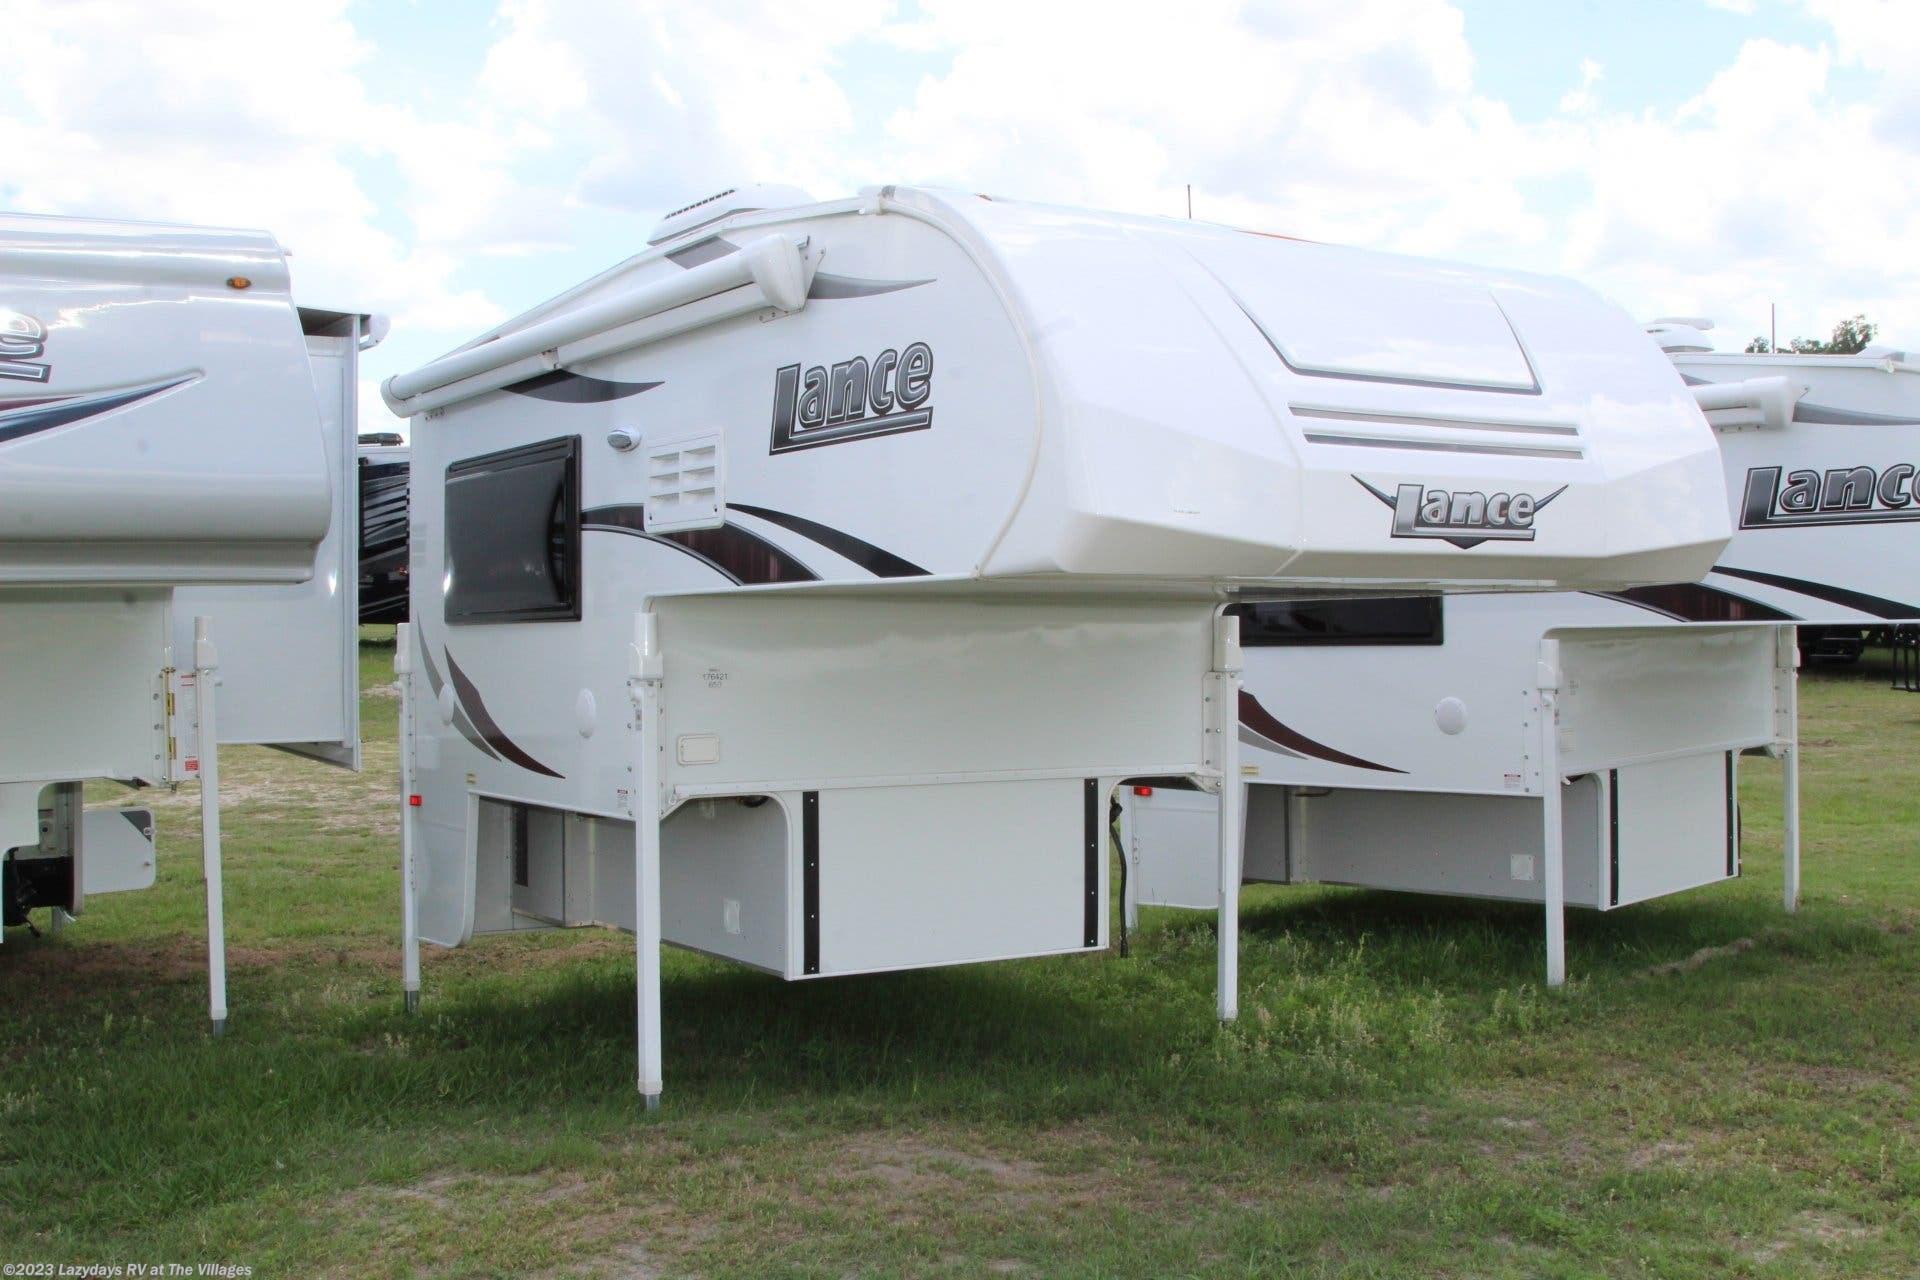 Truck Camper For Sale >> 2020 Lance Rv Truck Camper For Sale In Wildwood Fl 34785 Lanc6421